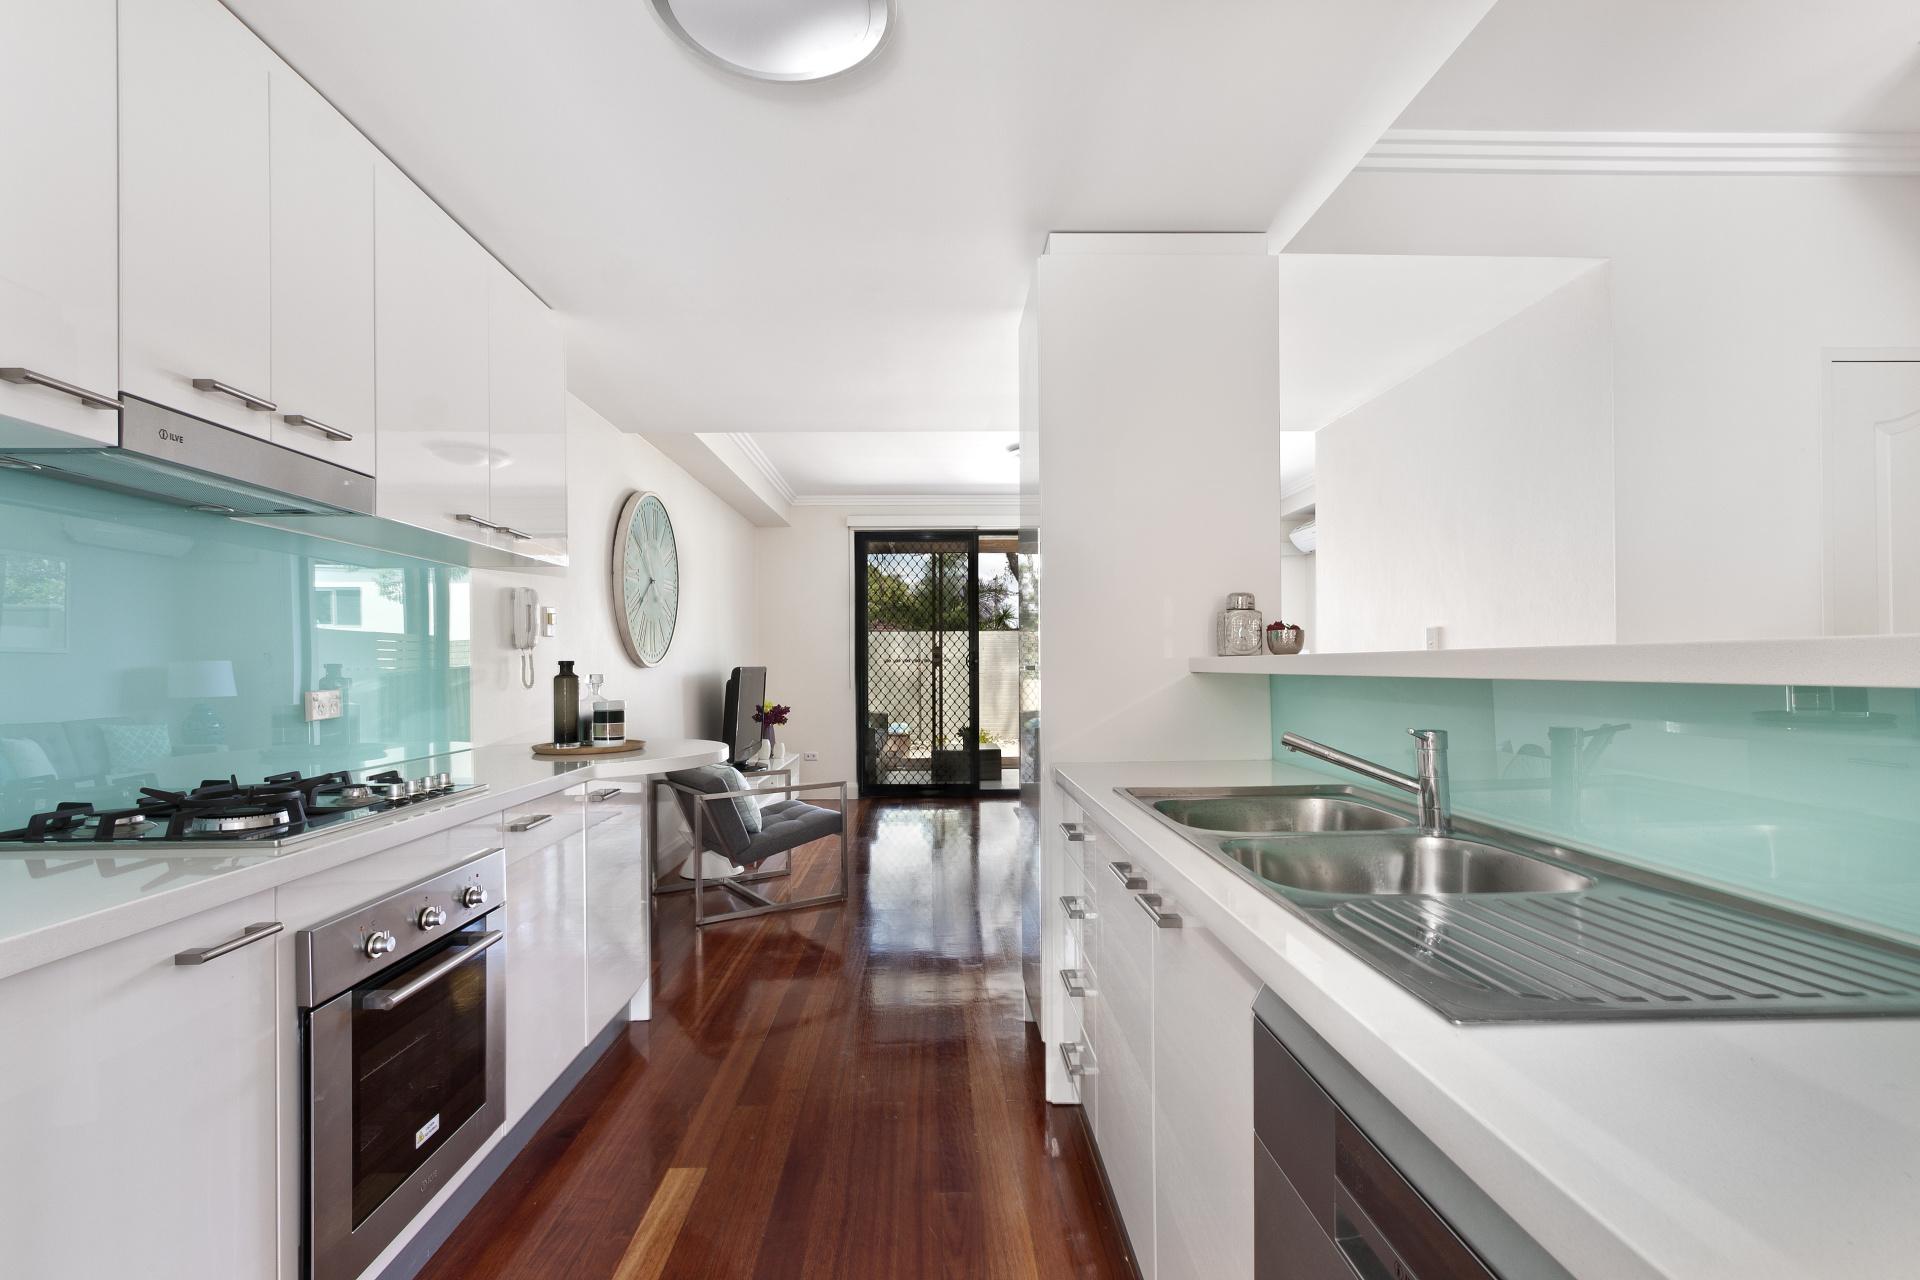 Modern gourmet kitchen interior. Landsons.co.uk